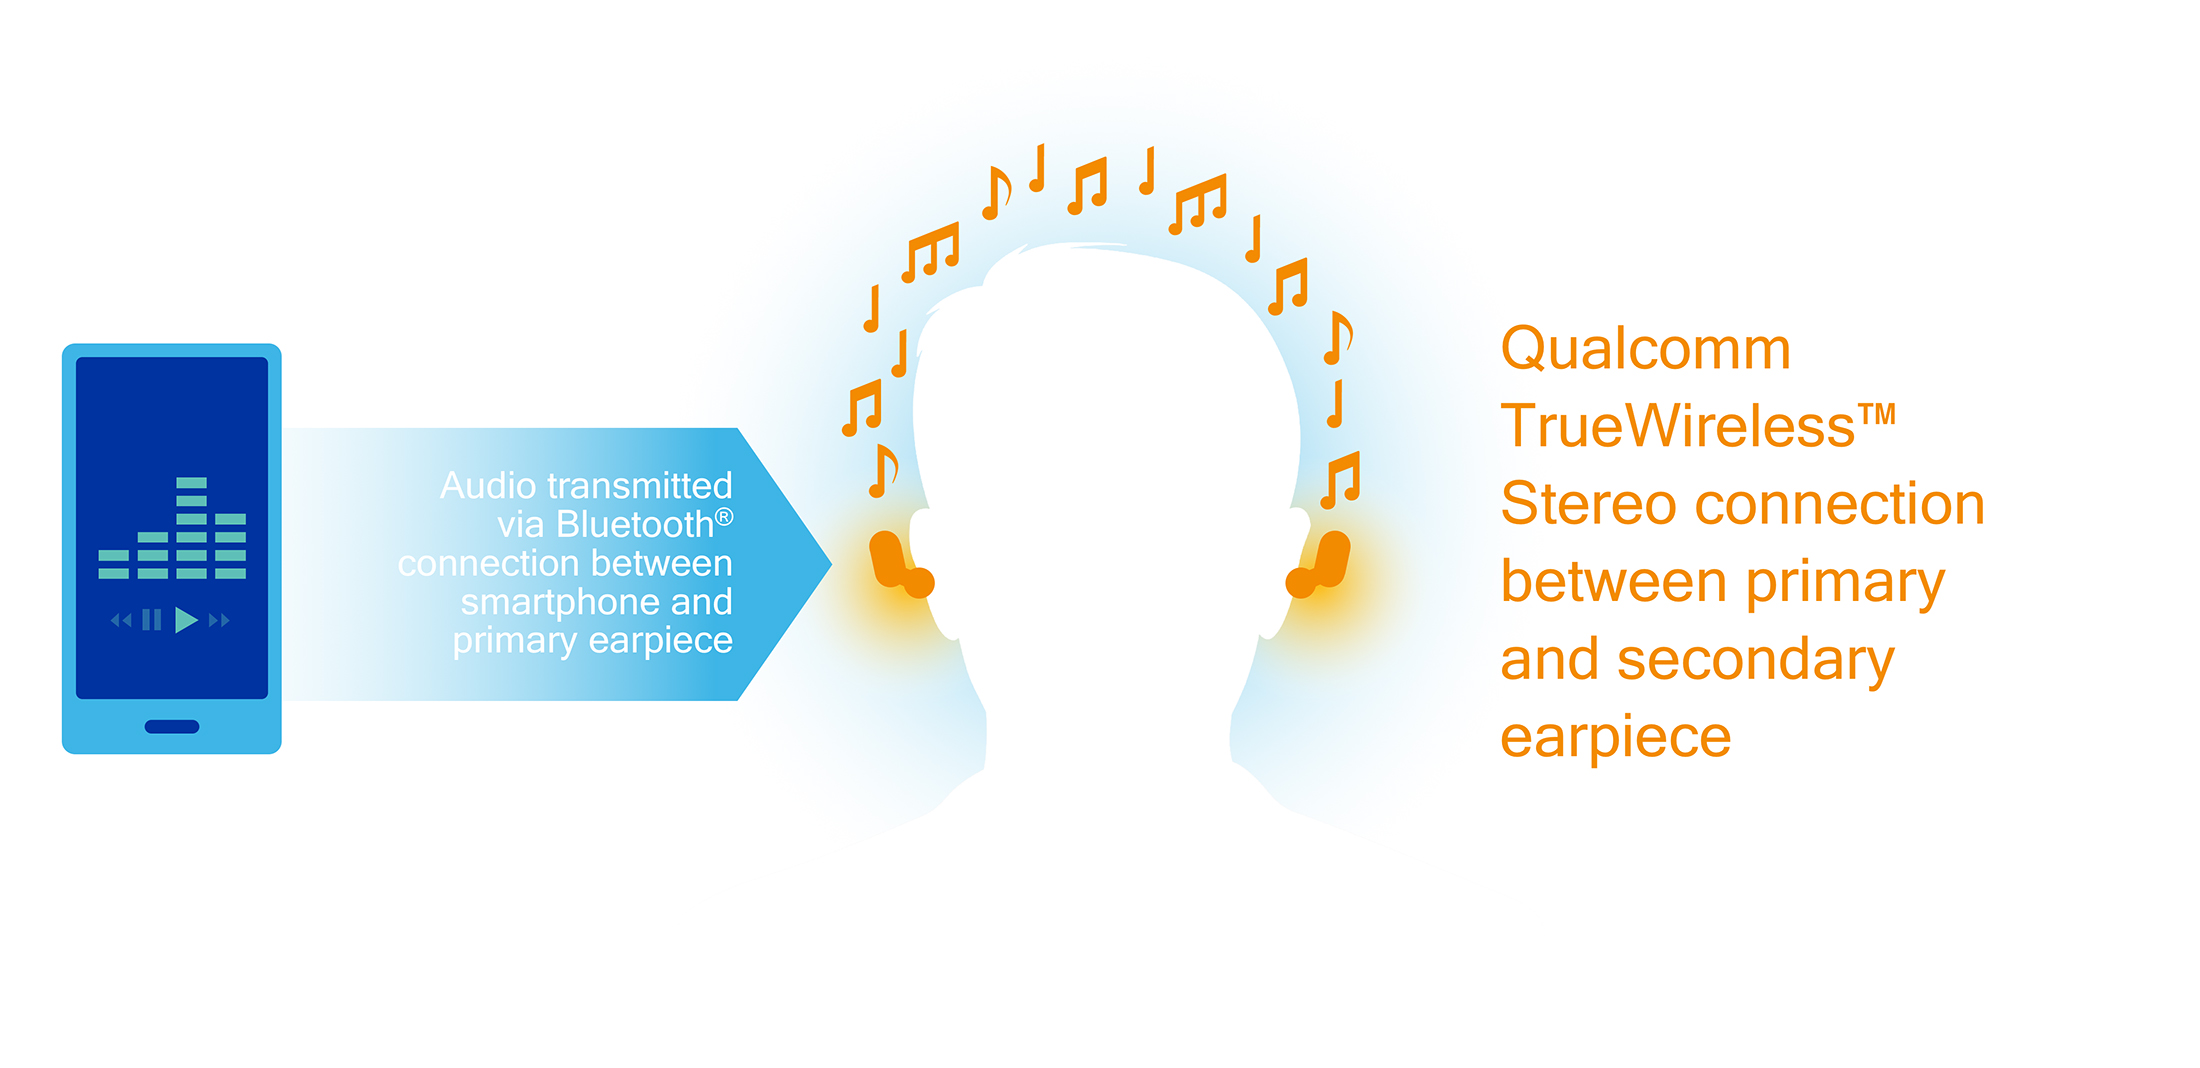 qualcomm-truewireless-stereo-infographic.jpeg